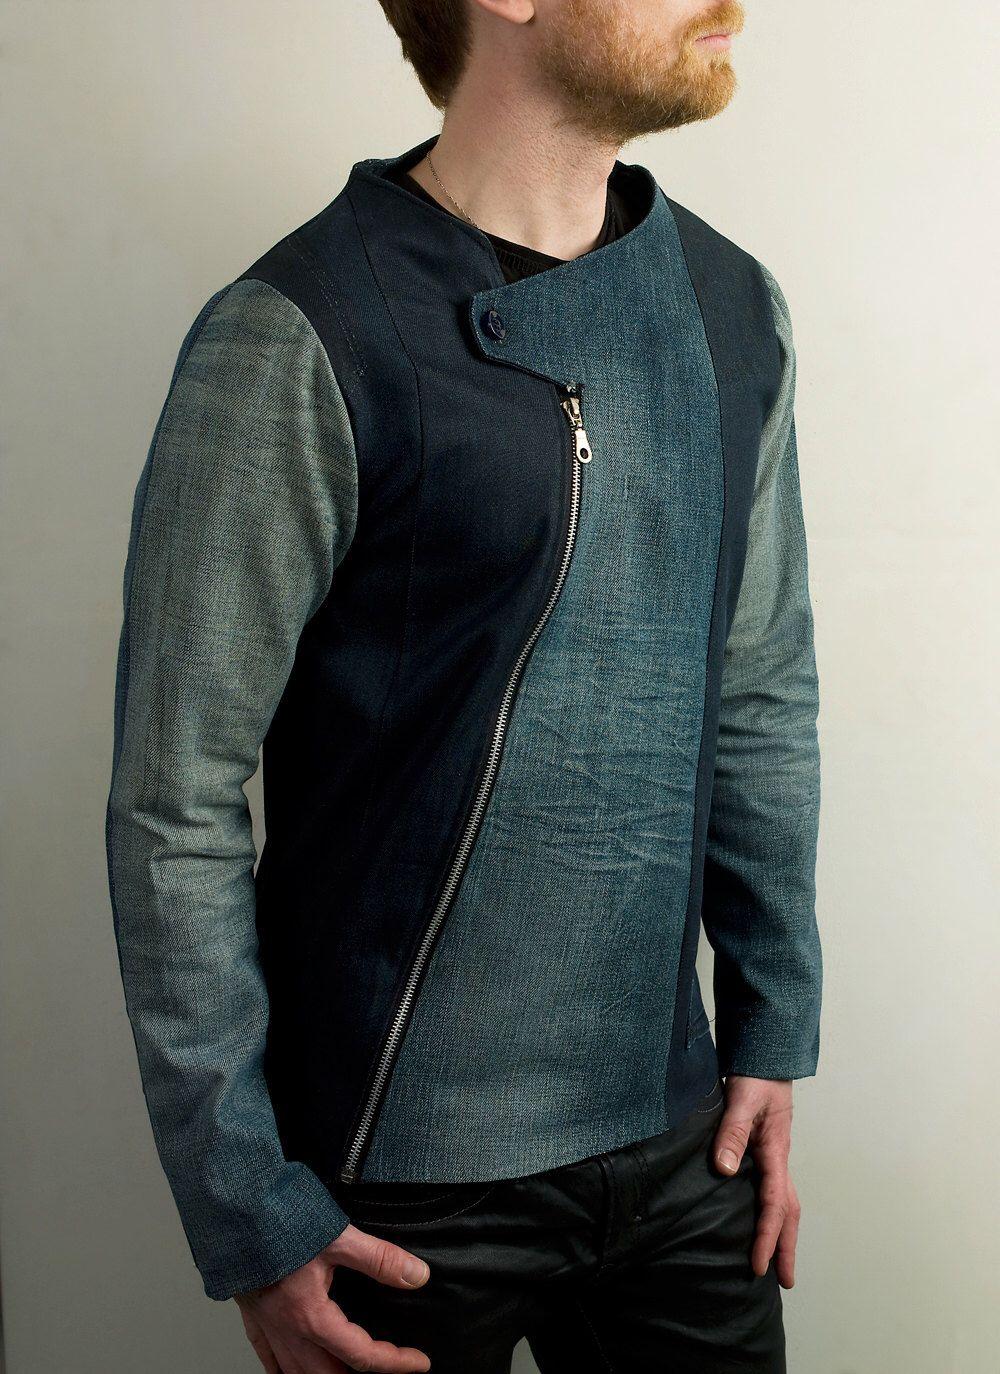 Mens Futuristic Asymmetrical Denim jacket by PopLoveHis on Etsy ...